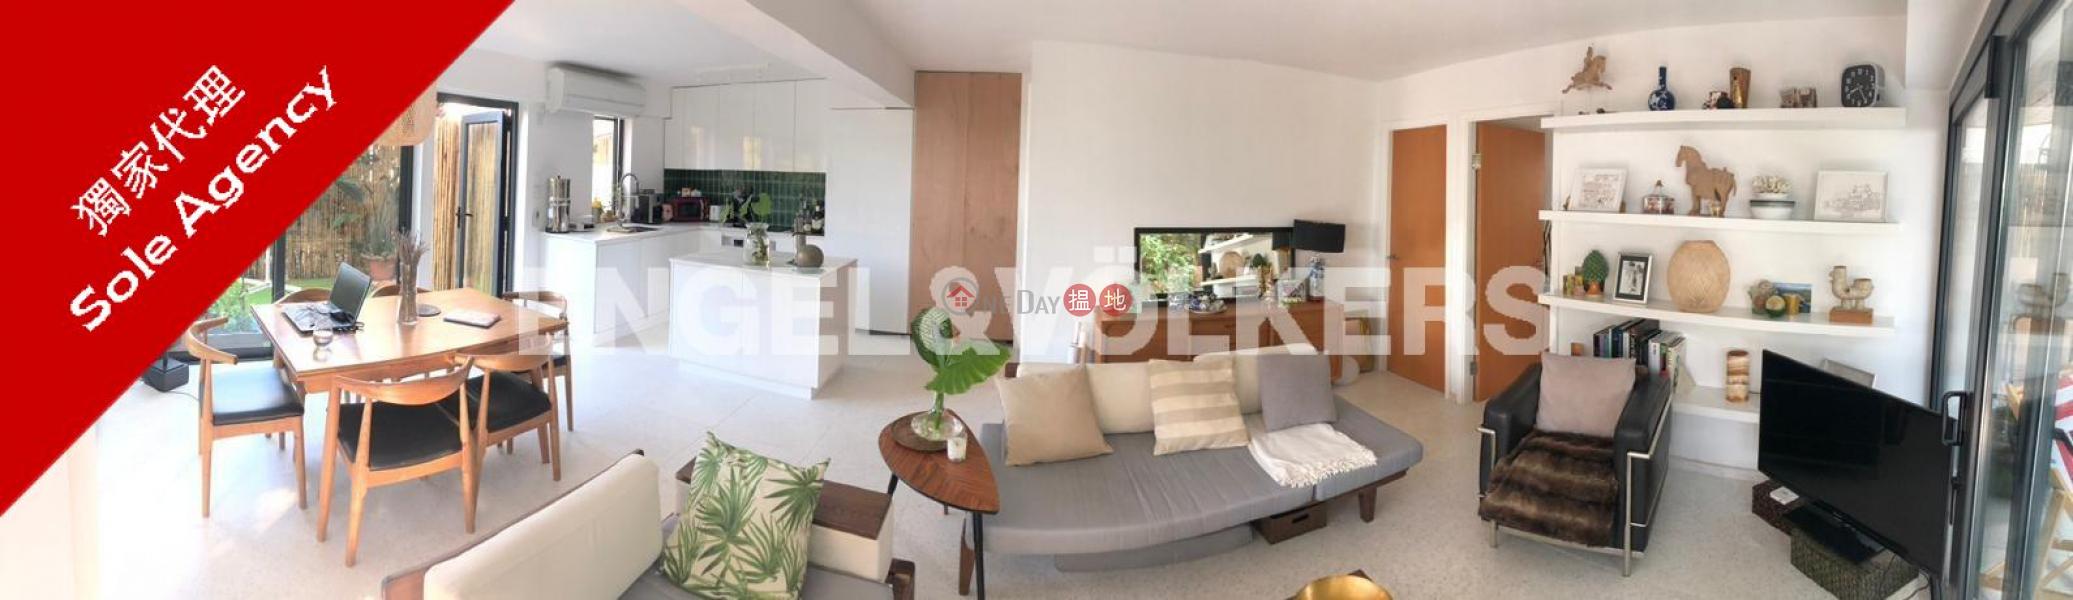 2 Bedroom Flat for Sale in Yung Shue Wan, Yung Shue Wan Main Street | Lamma Island | Hong Kong, Sales | HK$ 6.98M